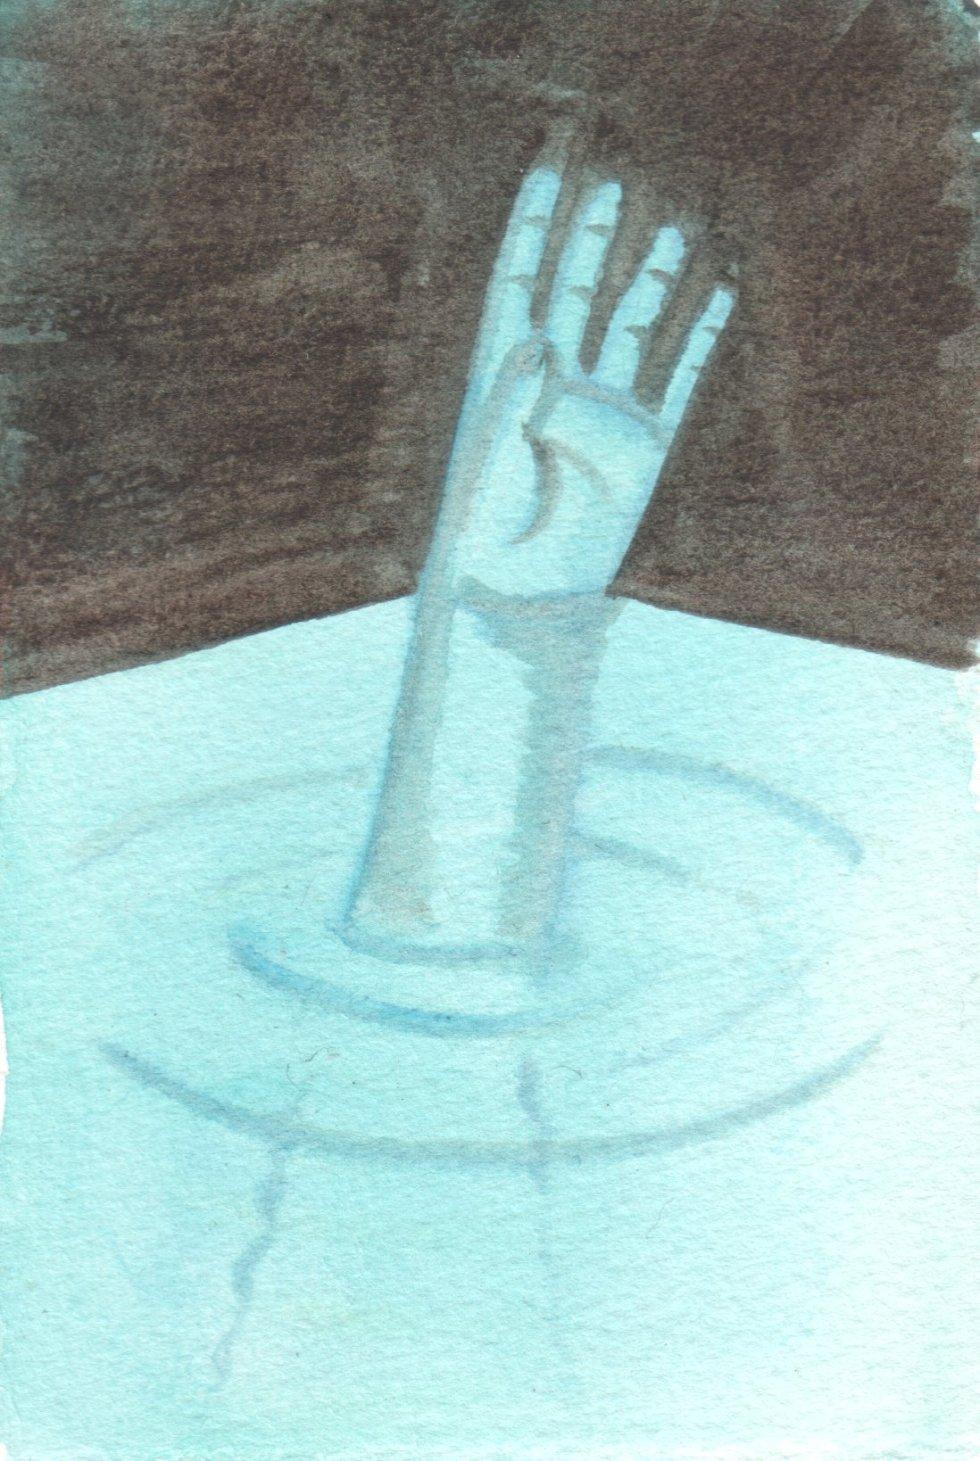 Fear of Drowning Jo Potocki Abstract Blue Black Original Painting Watercolor Art   eBay